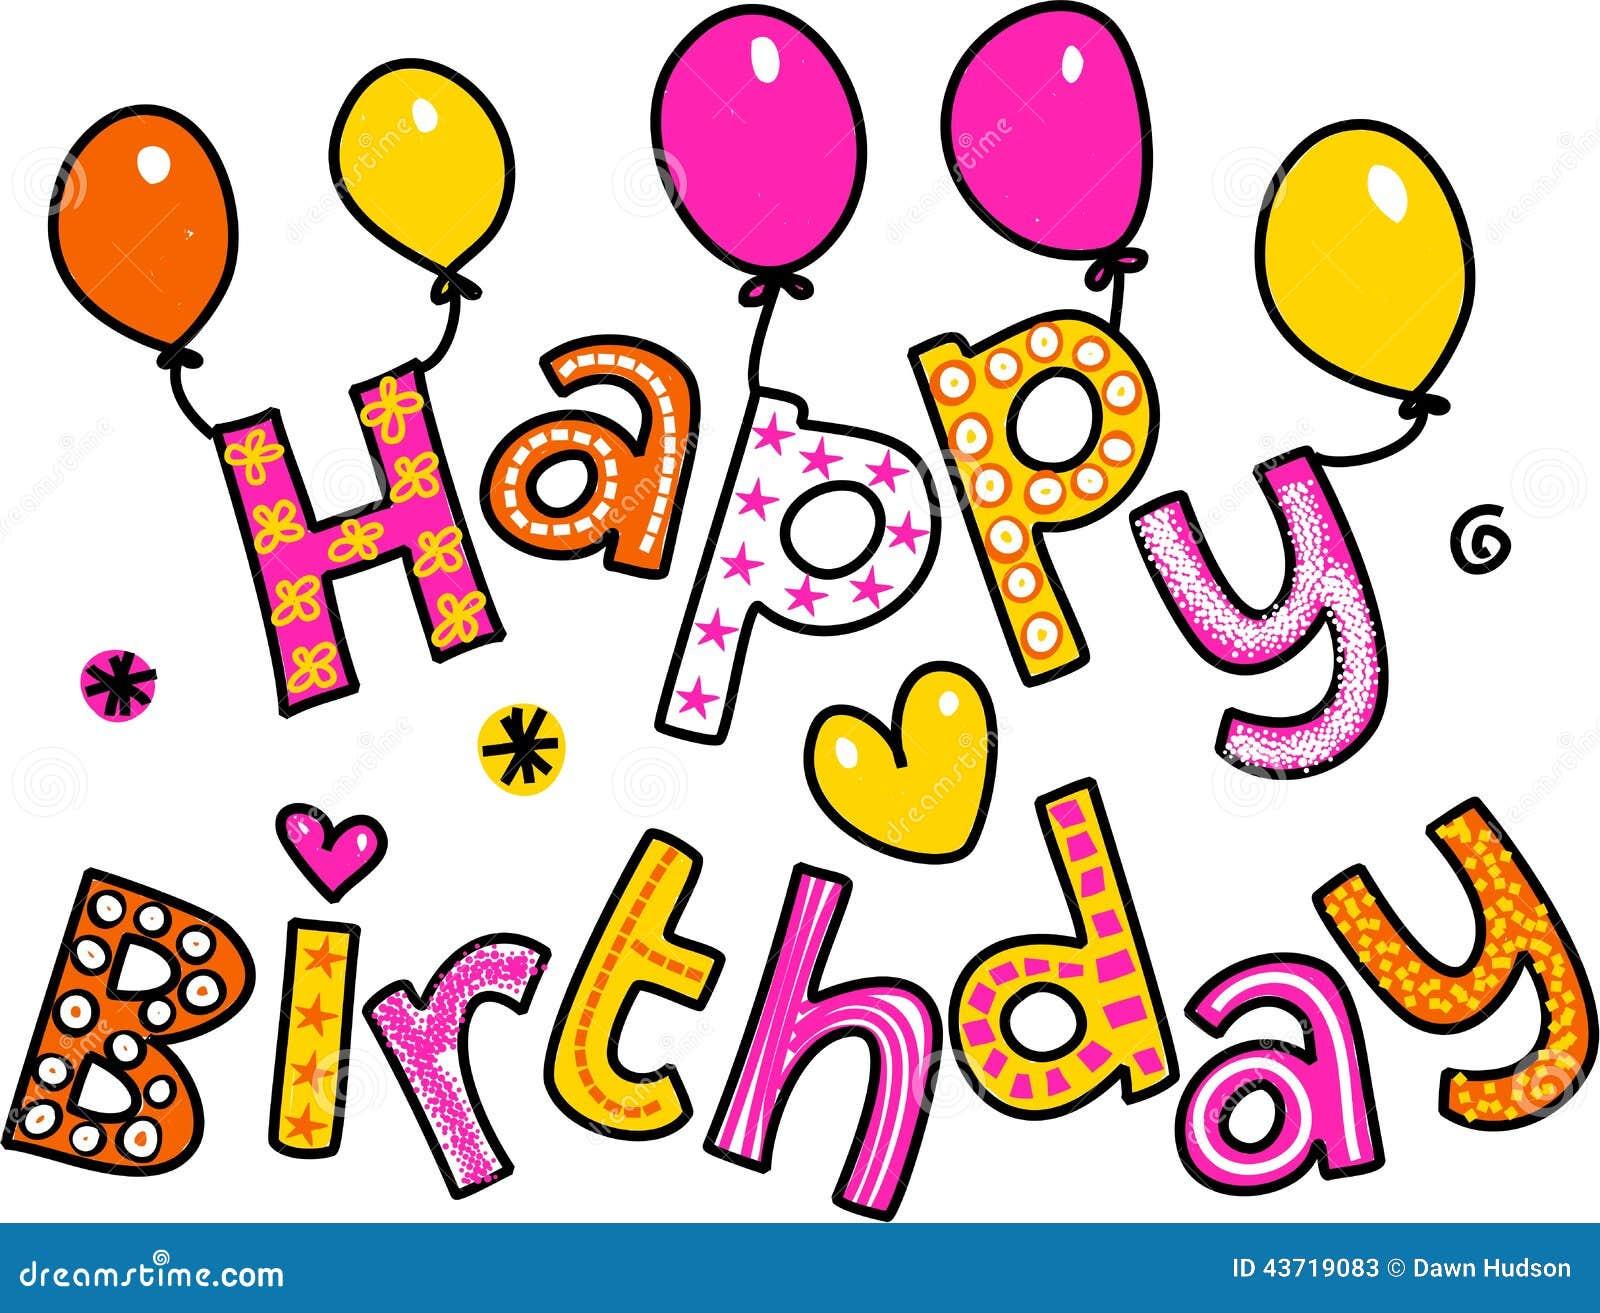 happy birthday cartoon text clipart stock illustration rh dreamstime com dreamtime clipart free Flags Clip Art Dreamstime